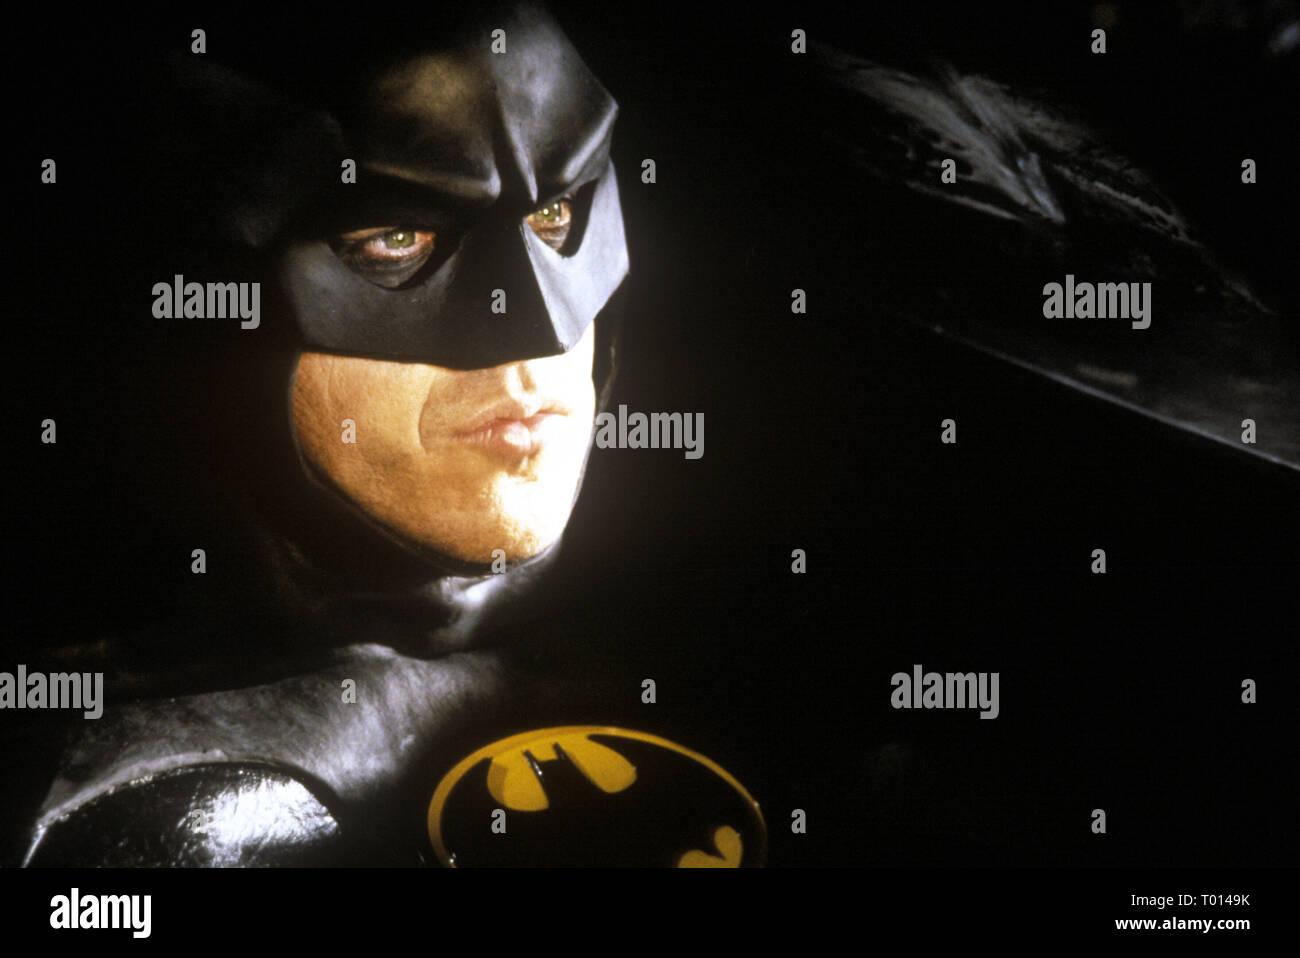 Michael Keaton Batman 1989 Stock Photo Alamy